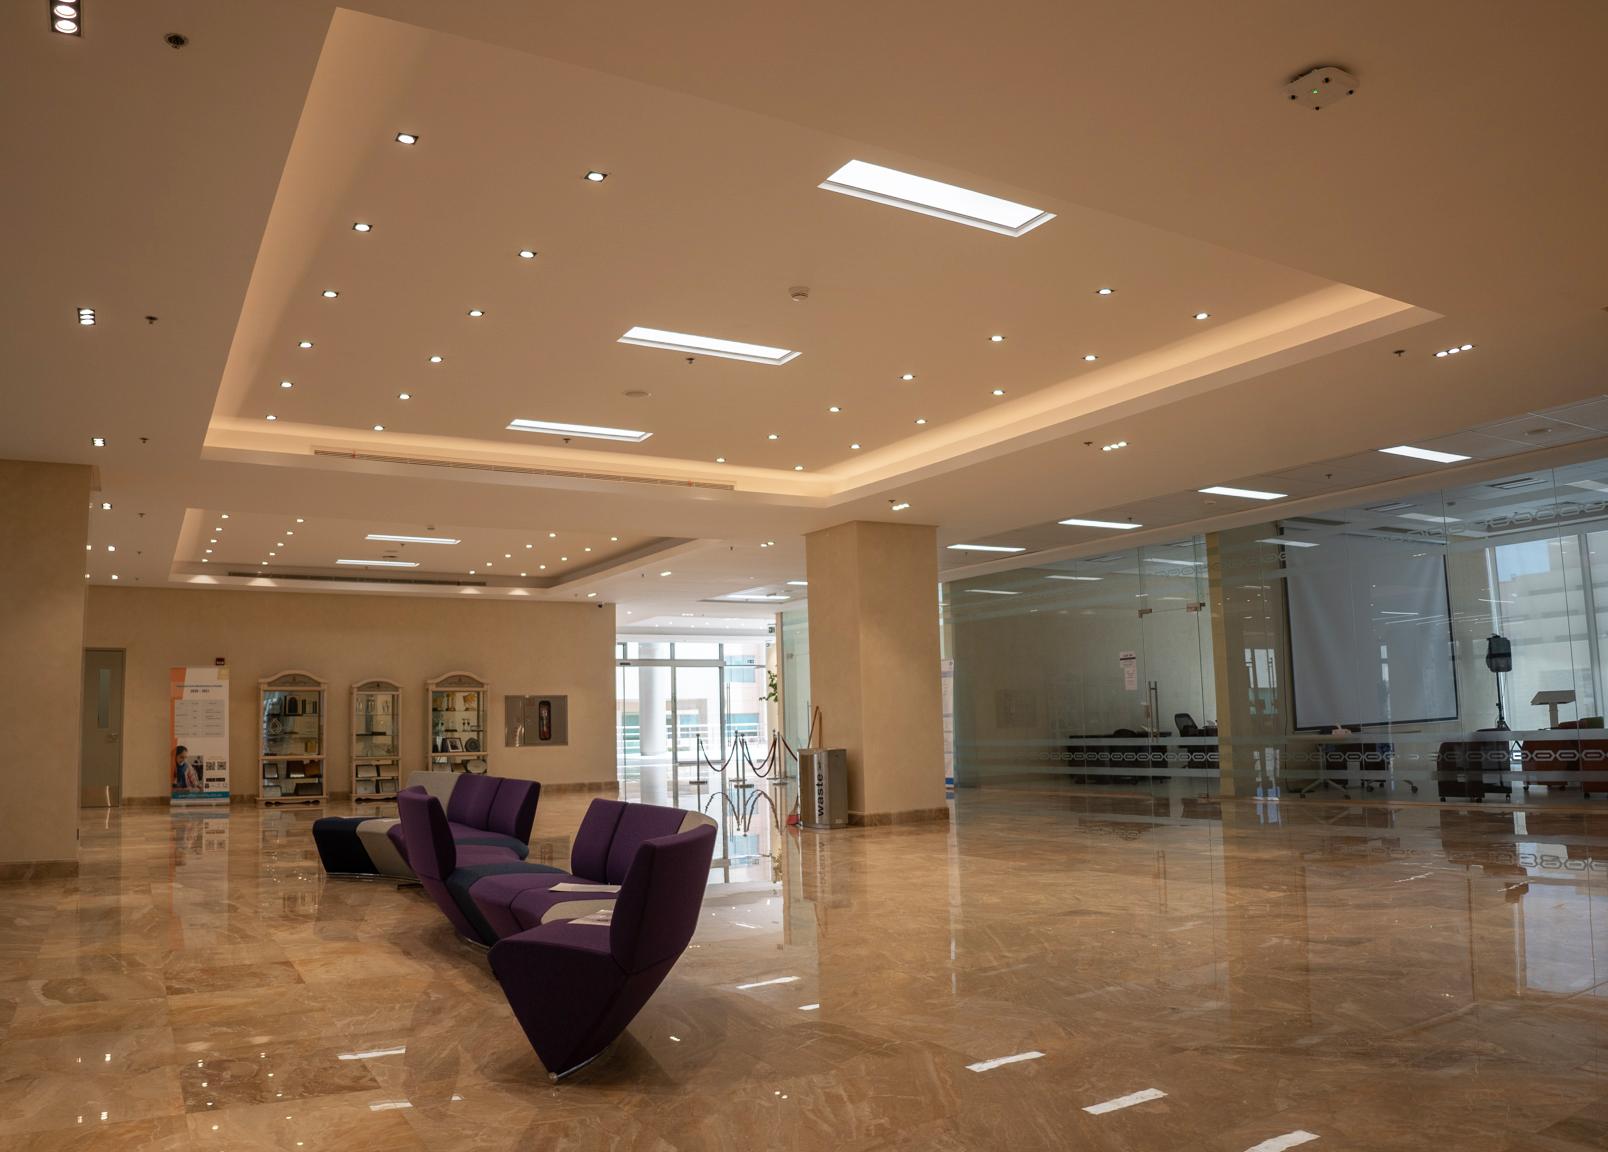 Effat University – Jeddah, KSA